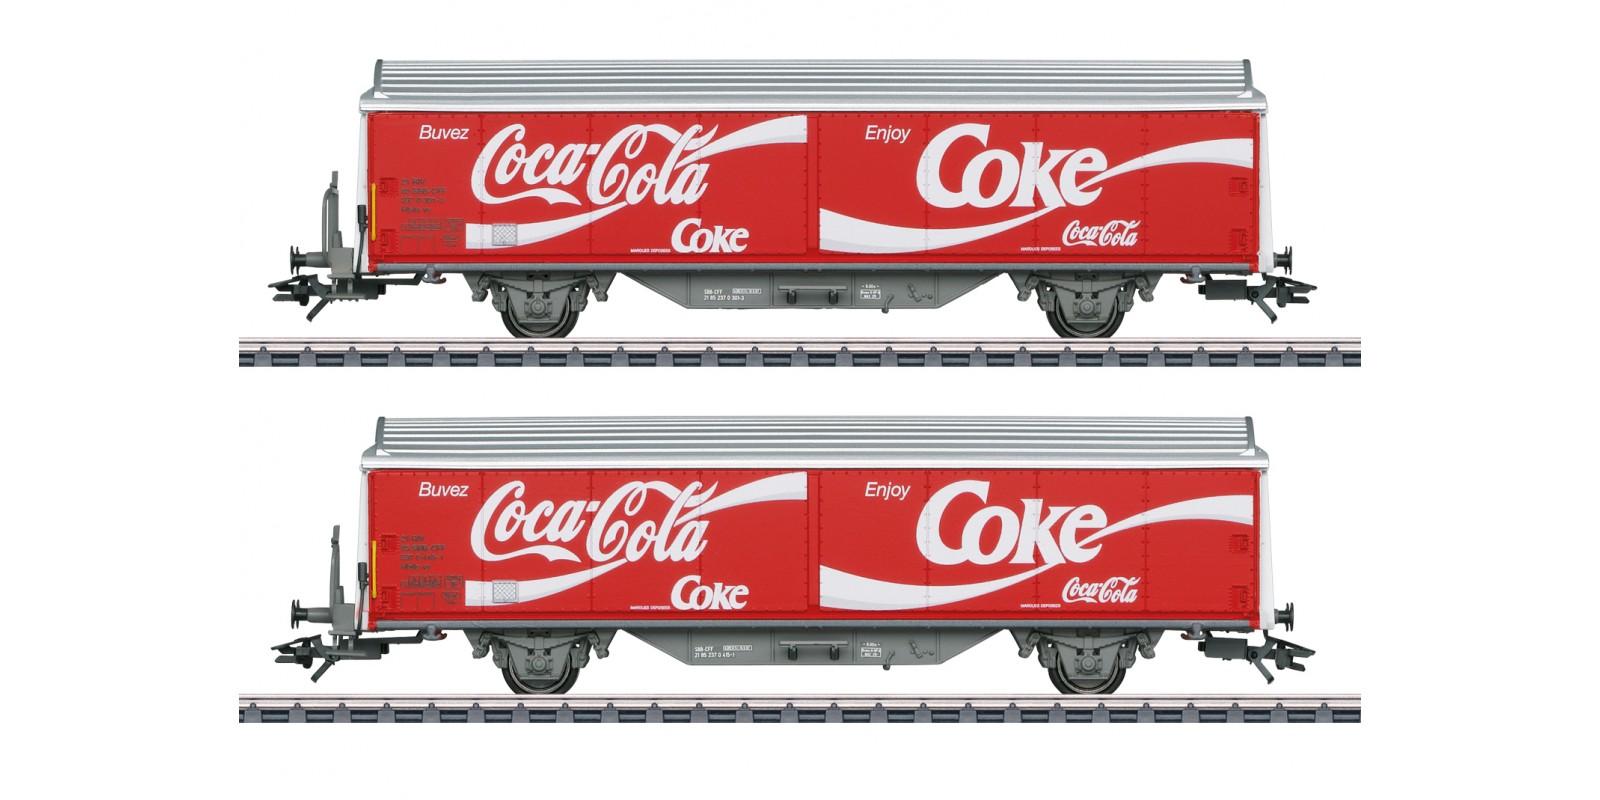 048344 Type Hbils-vy Sliding Wall Boxcar Set